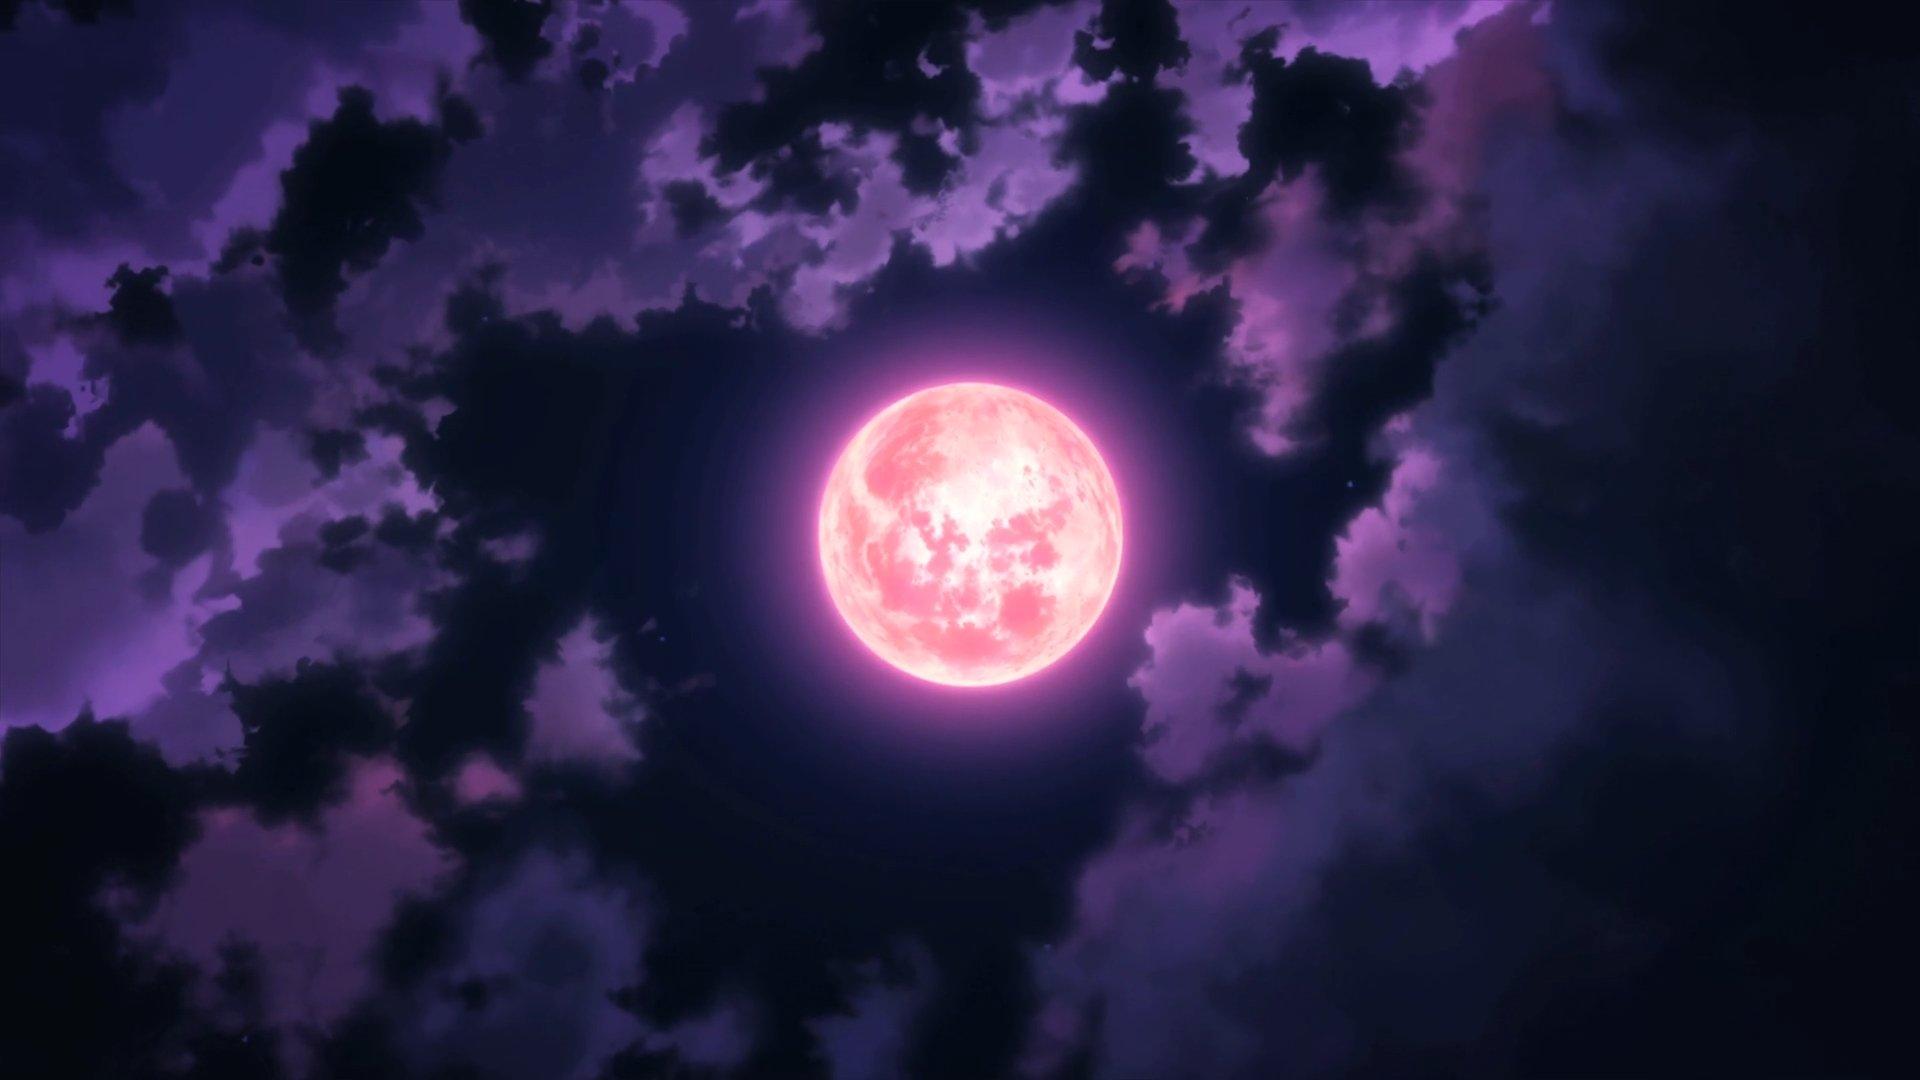 Aesthetic Moon Wallpaper For Pc